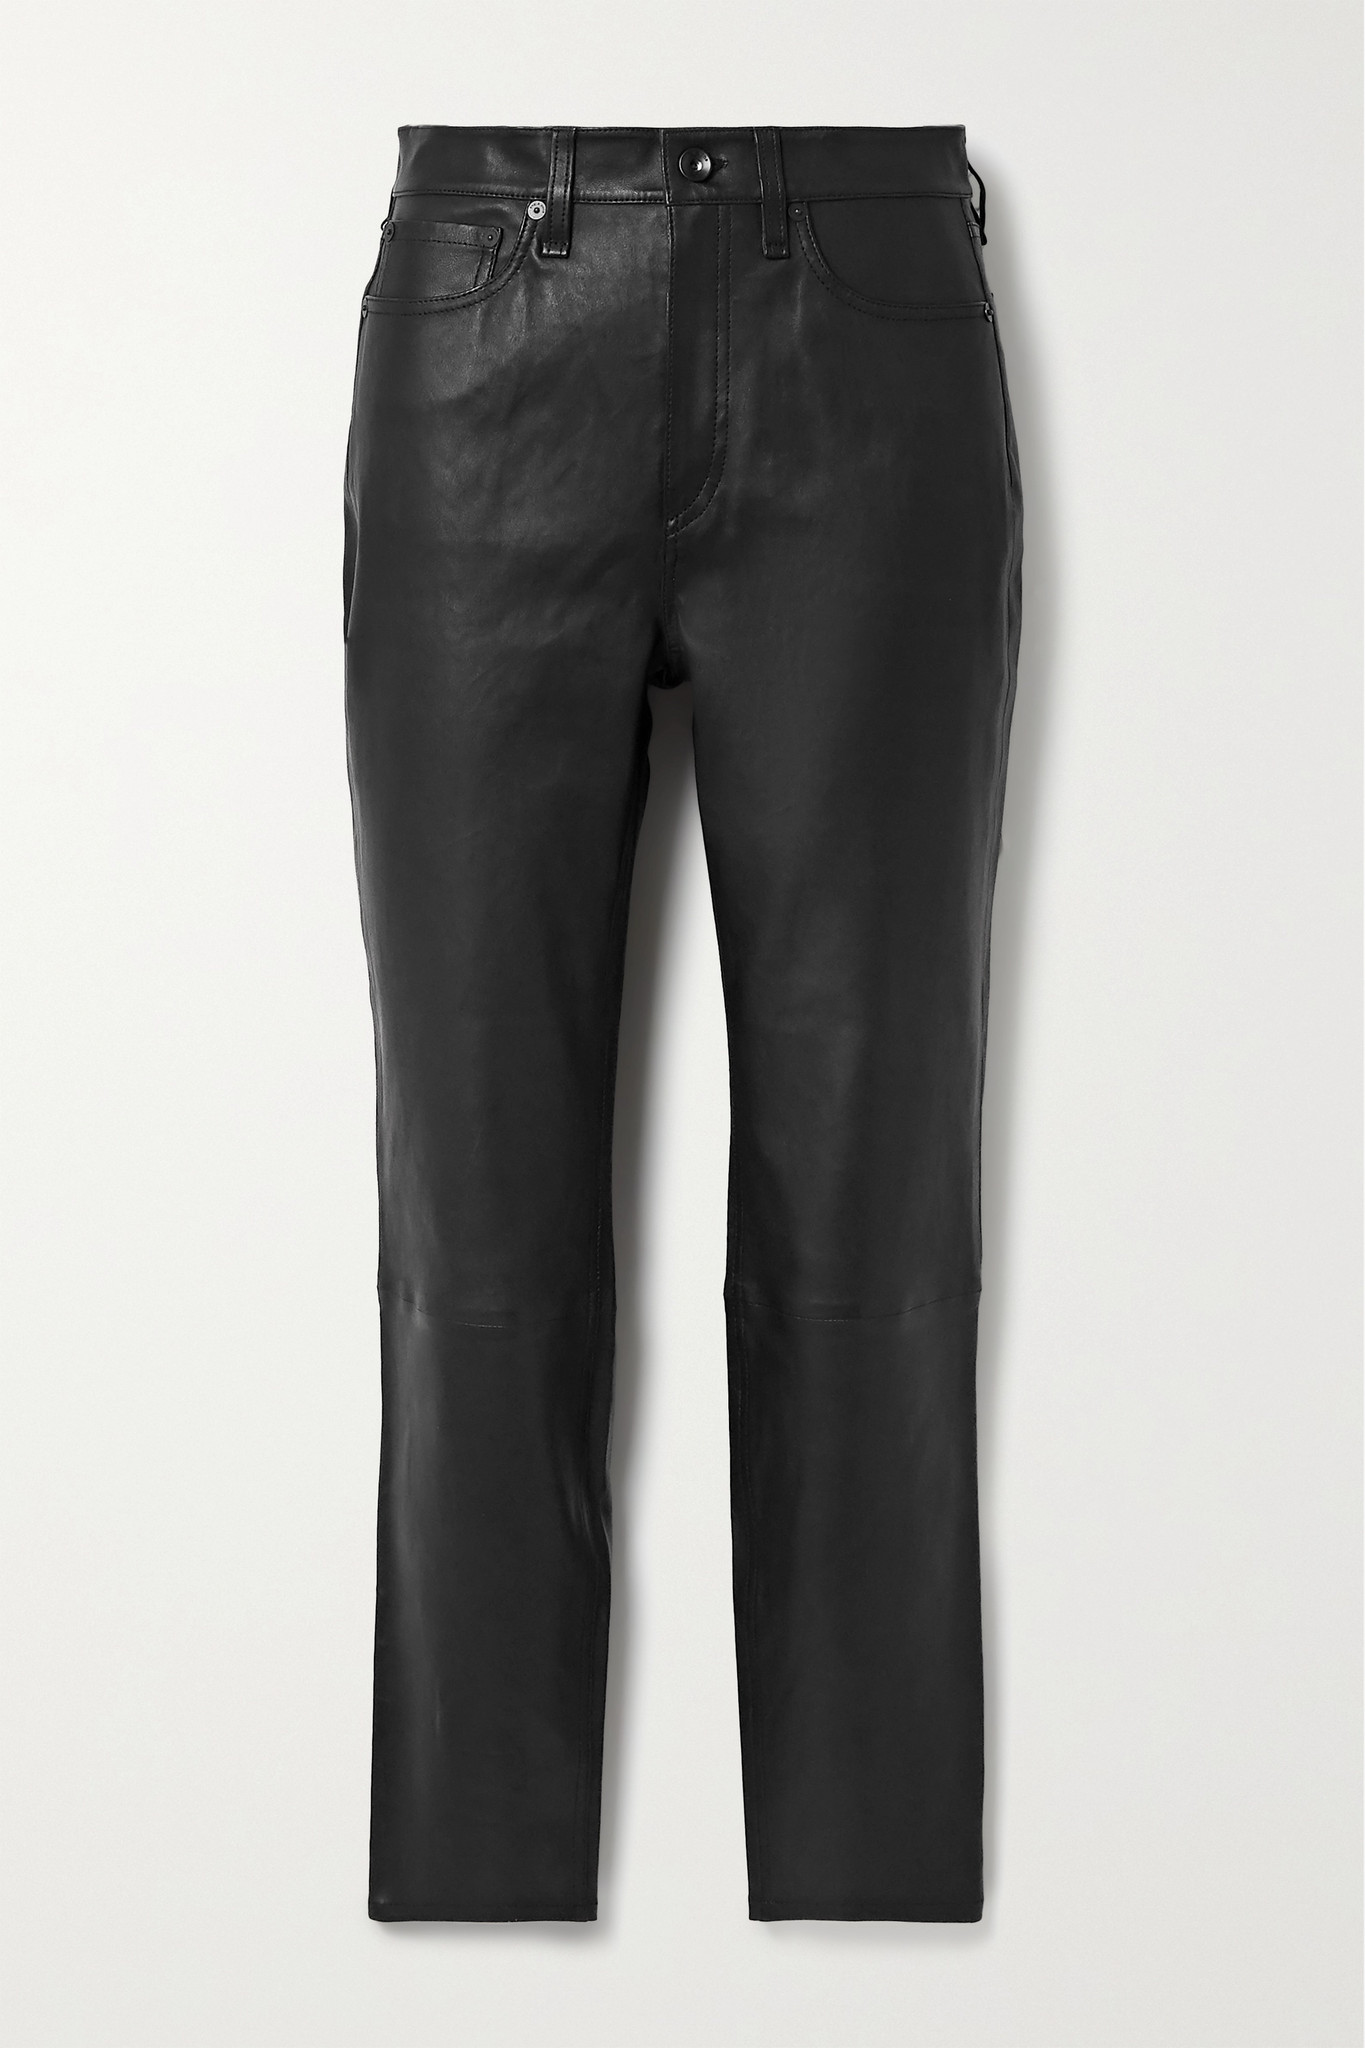 RAG & BONE - Nina Skinny Leather Pants - Black - 29